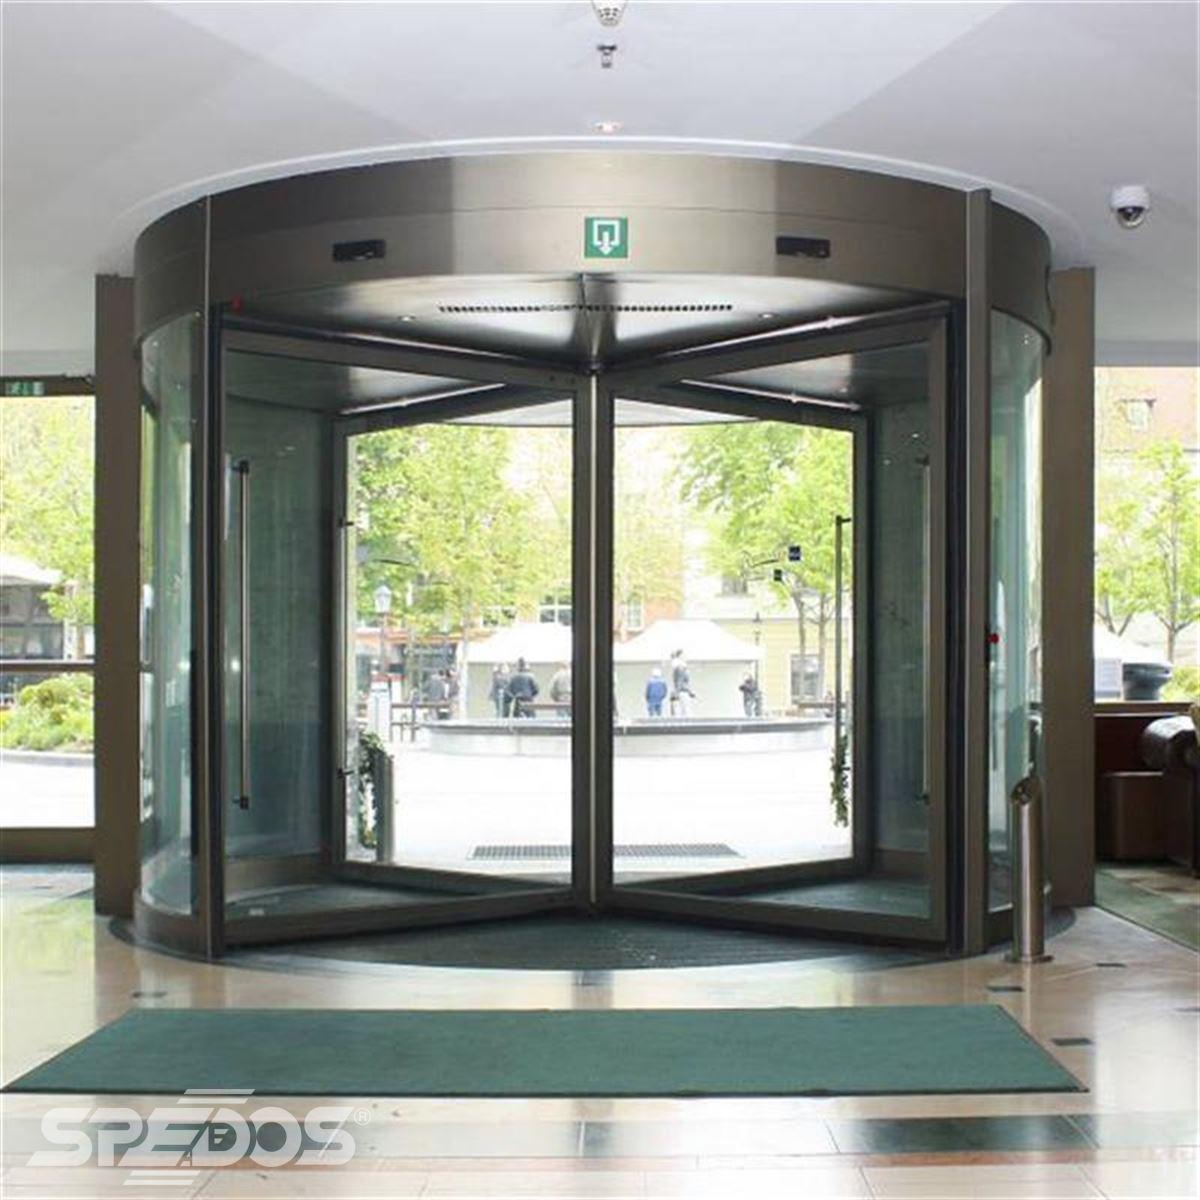 karuselové dveře Tourniket pro hotel Carlton Bratislava 3